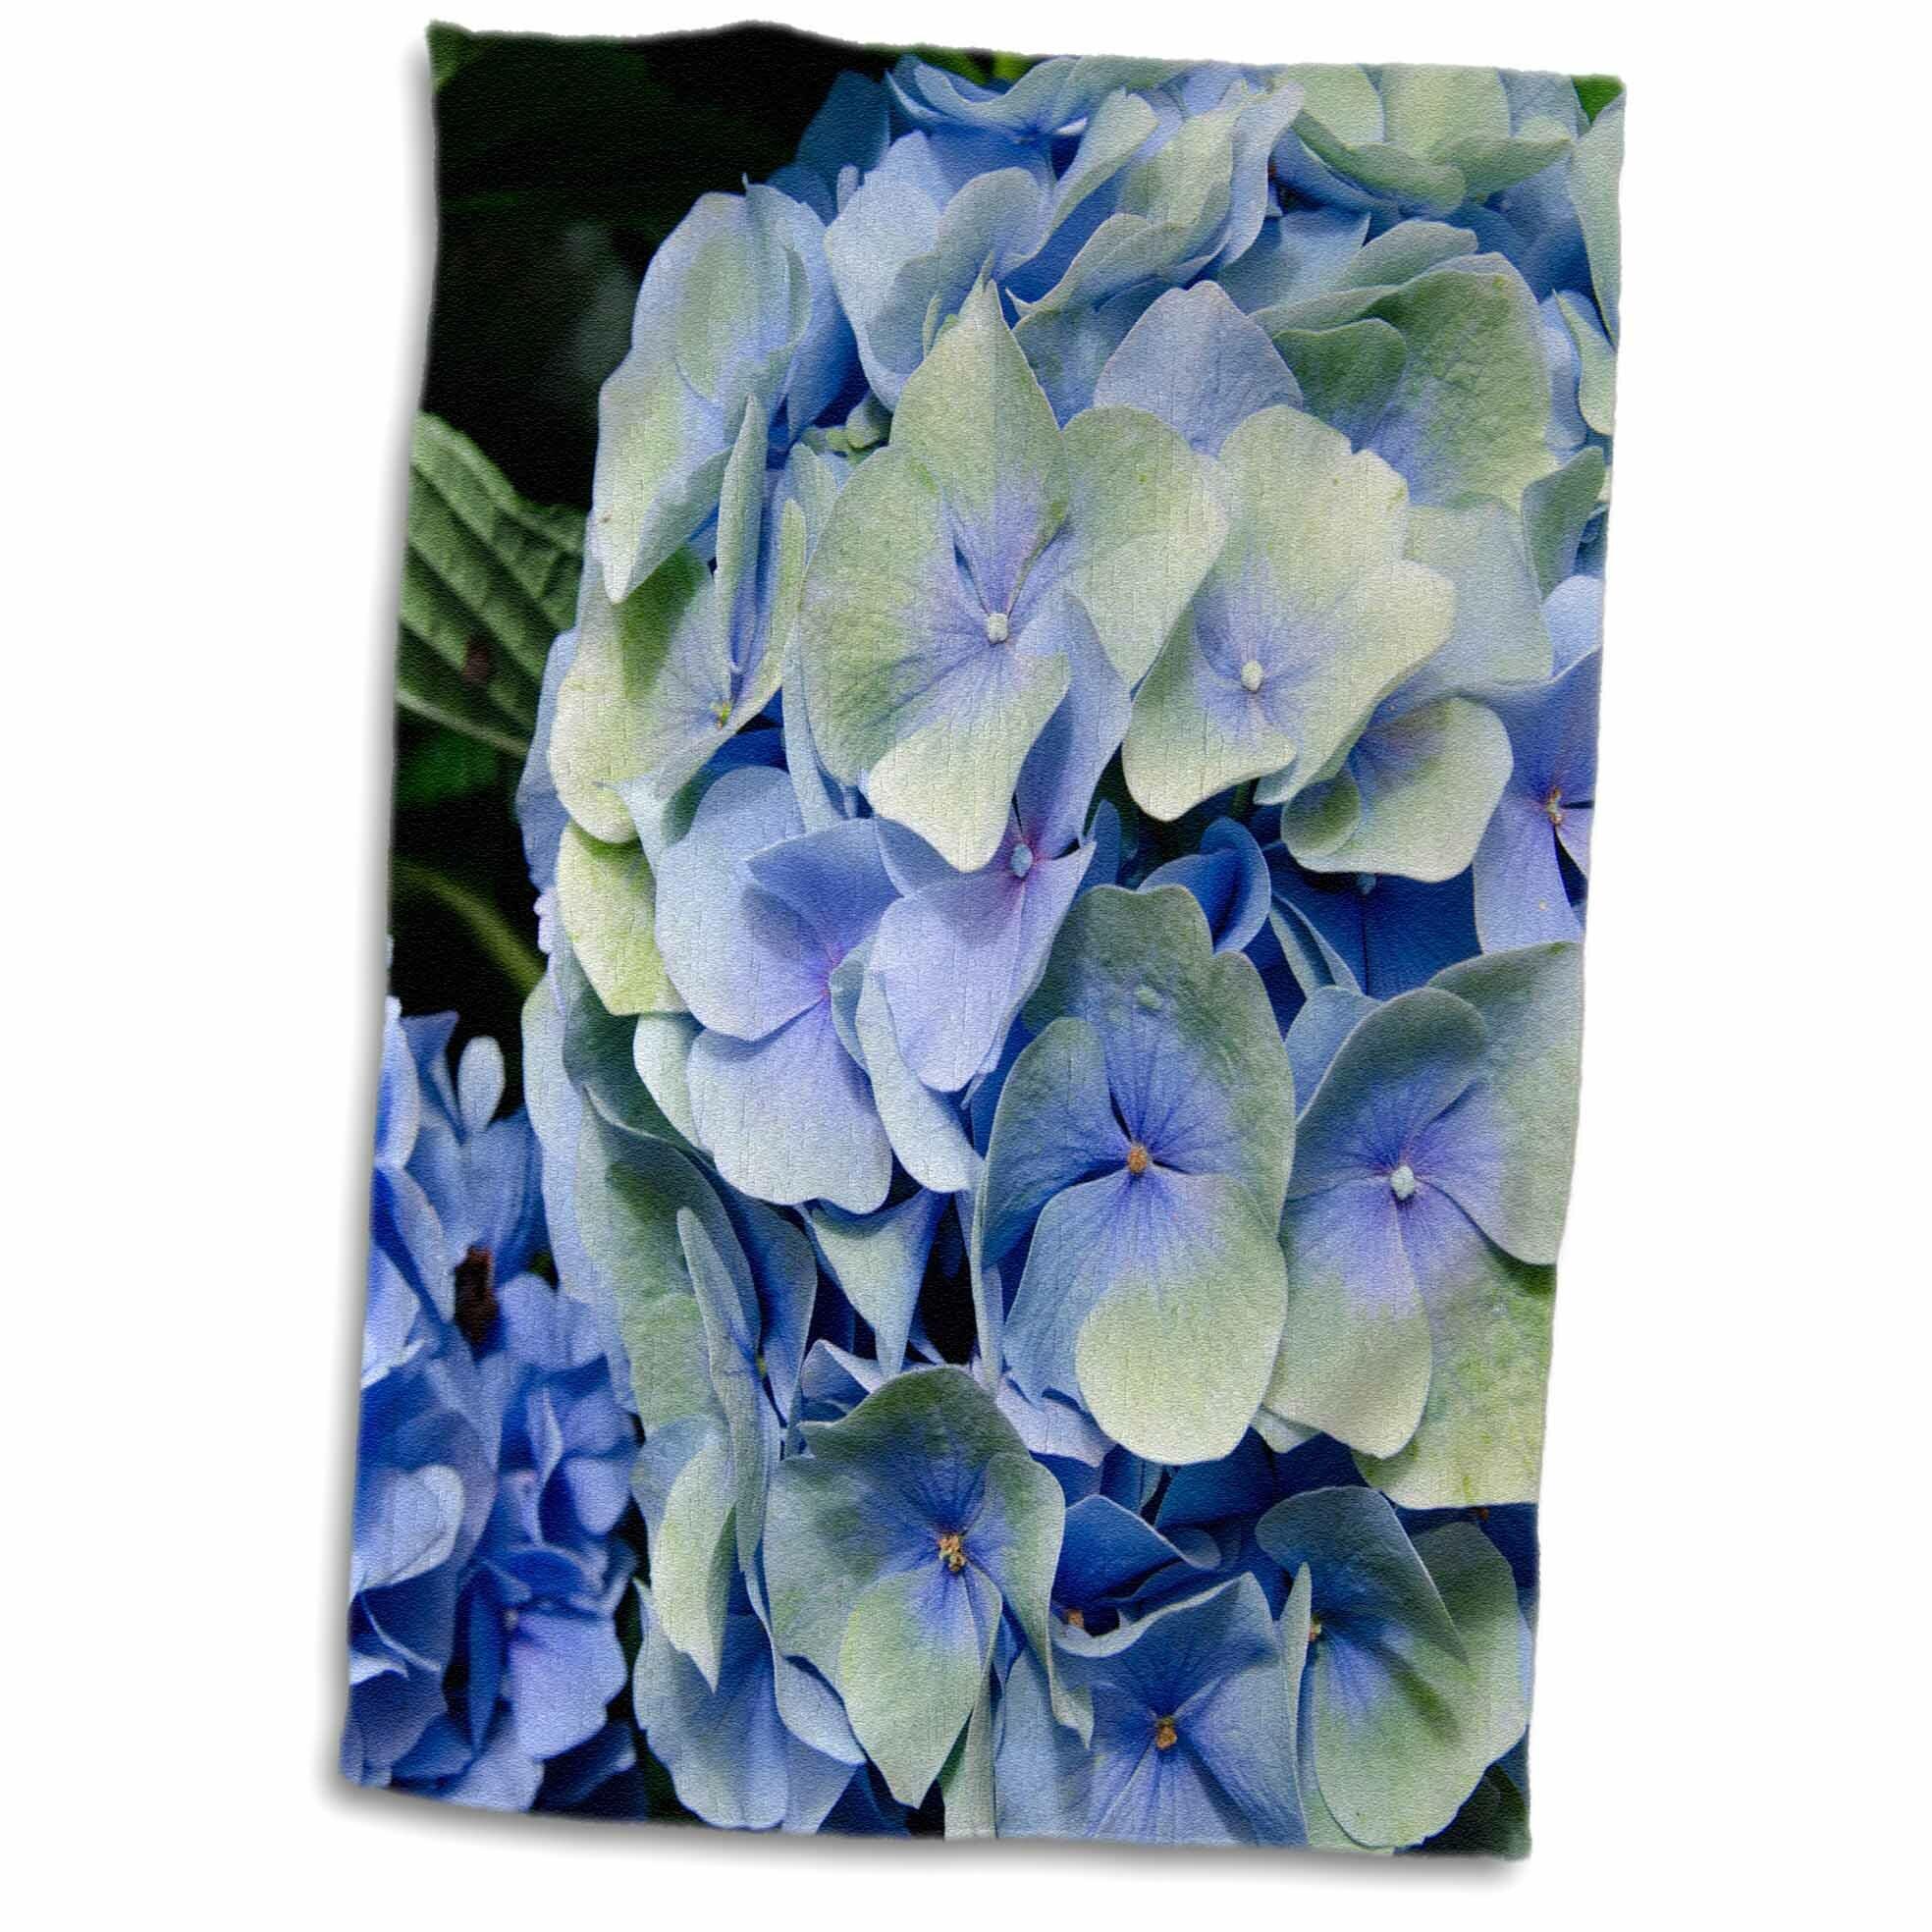 East Urban Home Willem Usa Alabama Theodore Bellingrath Gardens And Home Hydrangea Flower Hand Towel Wayfair